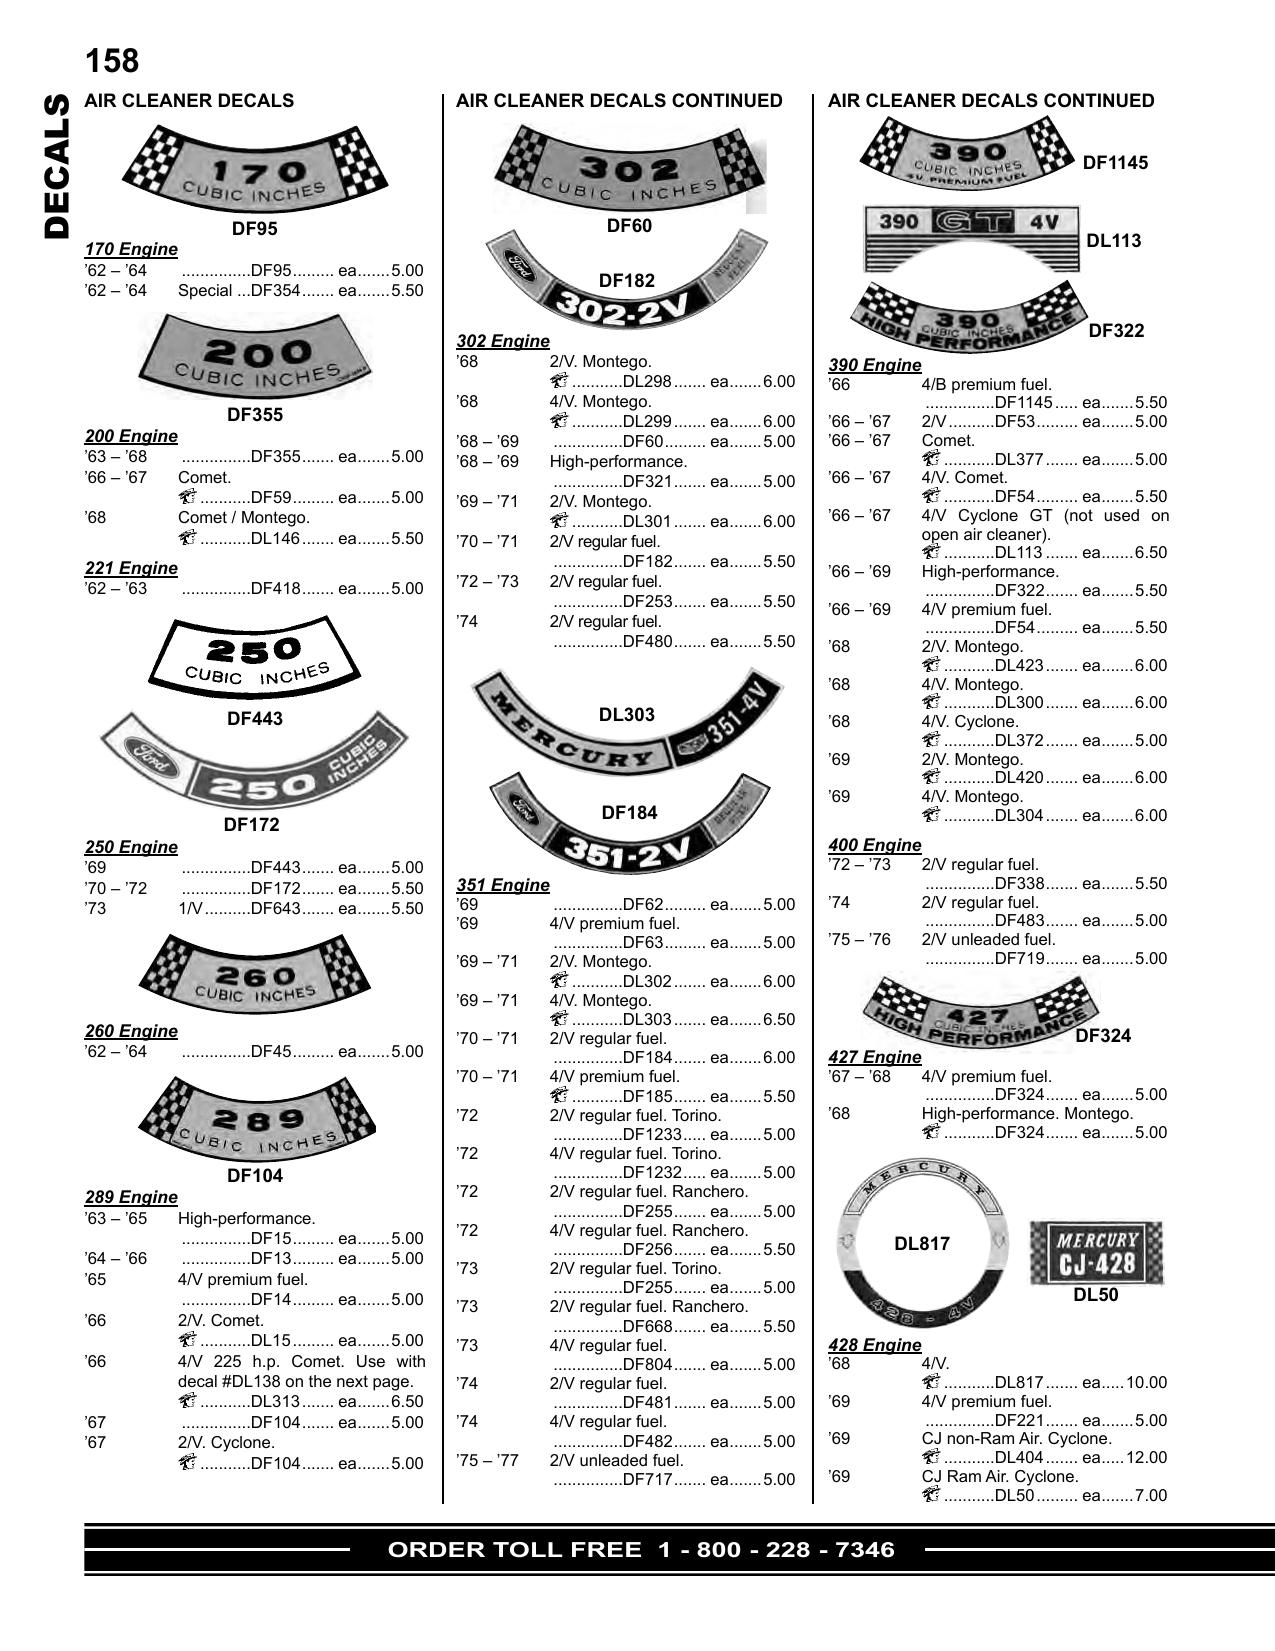 58 Decals Auto Krafters Manualzz